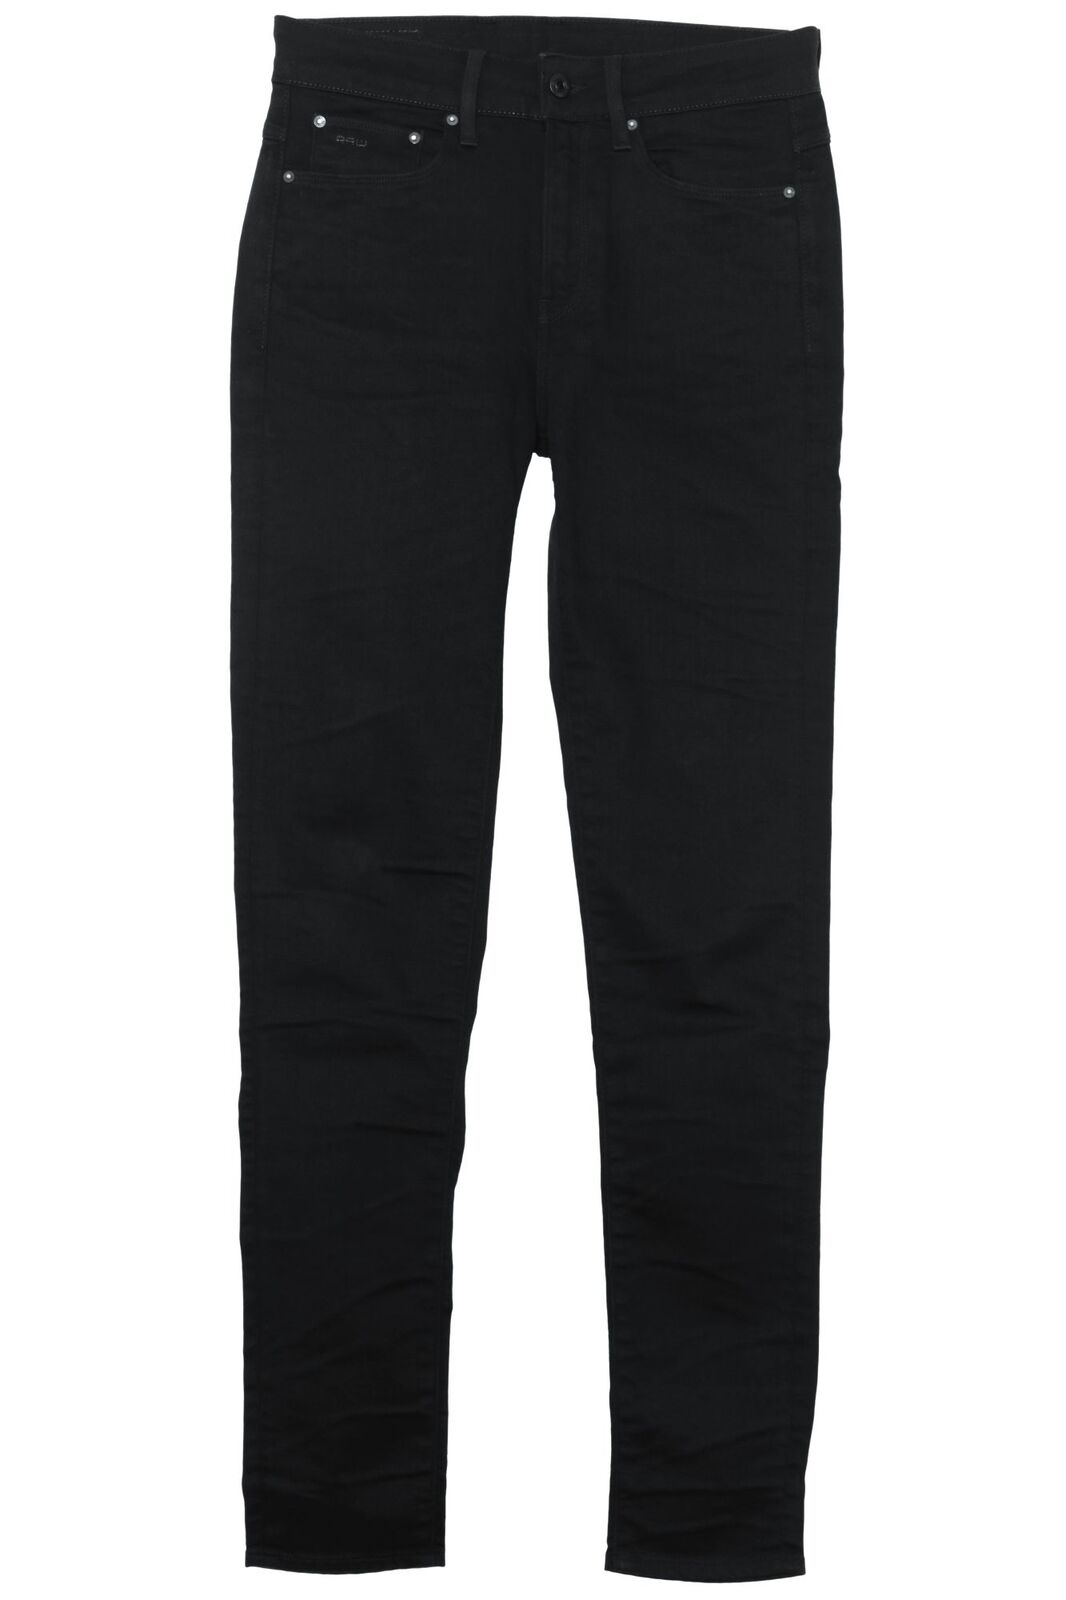 G STAR 3301 Ultra High super jeans jeans jeans skinny alta federale Pantaloni Denim Donna Stretch e75551